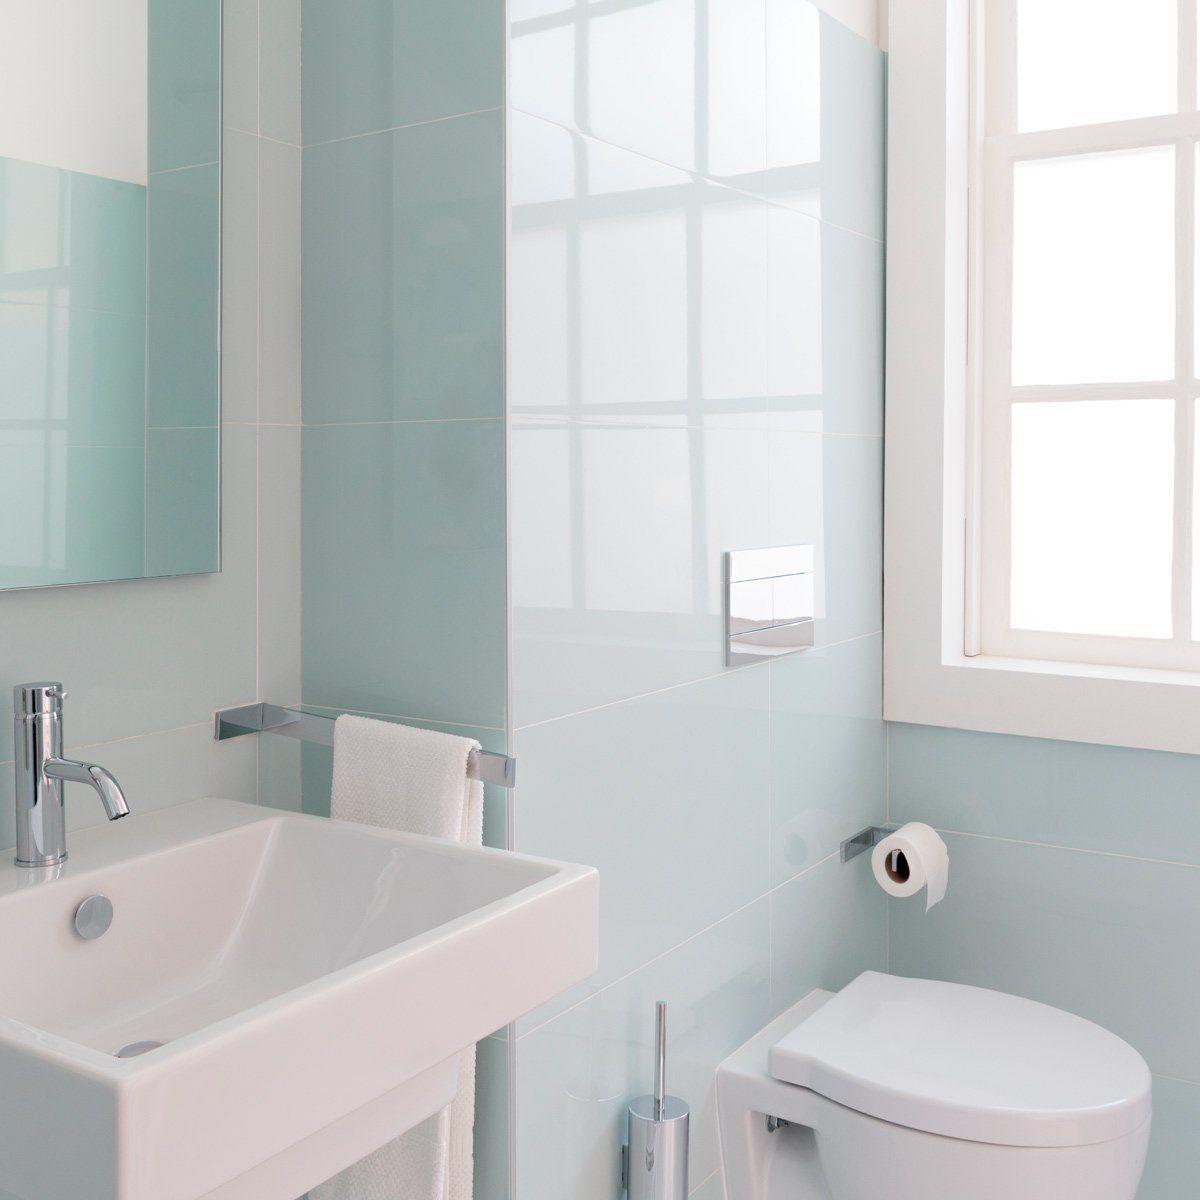 best colors for small bathrooms garage doors small on best paint colors for bathroom with no windows id=19158